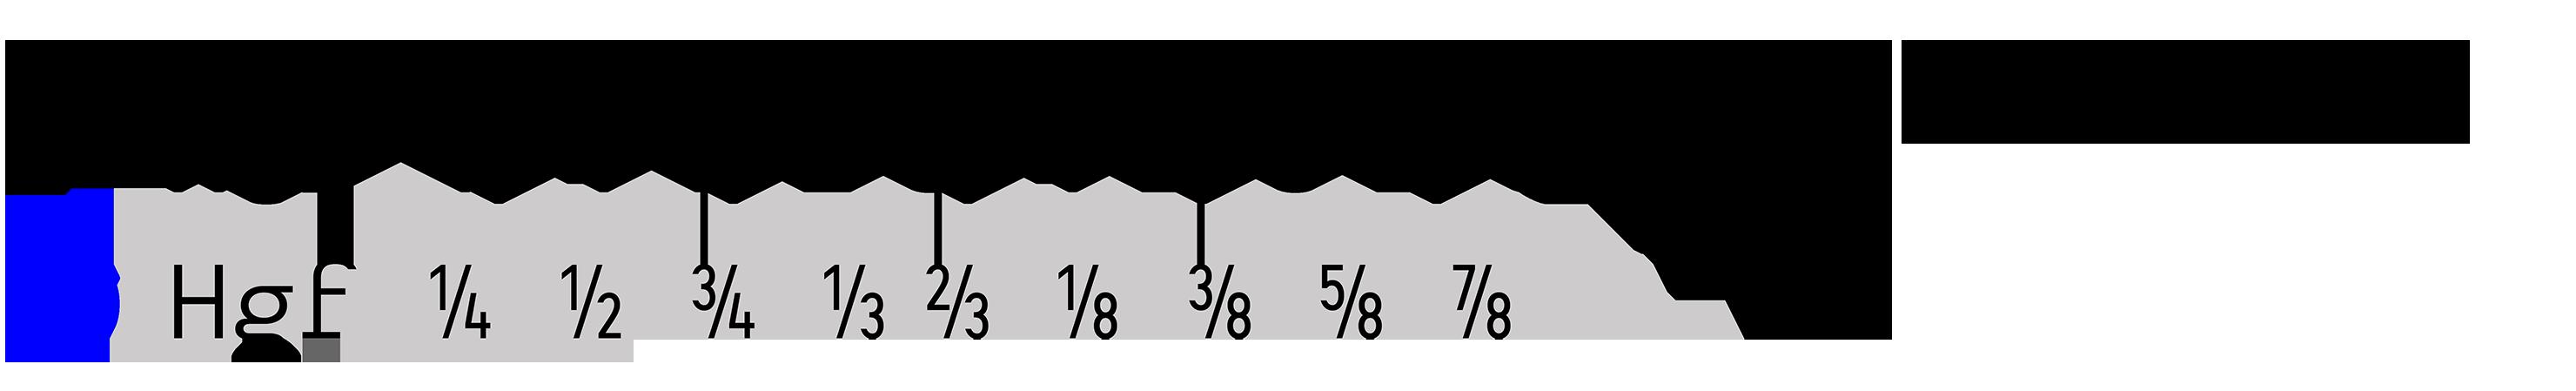 Typeface-Heimat-Mono-F10-Atlas-Font-Foundry